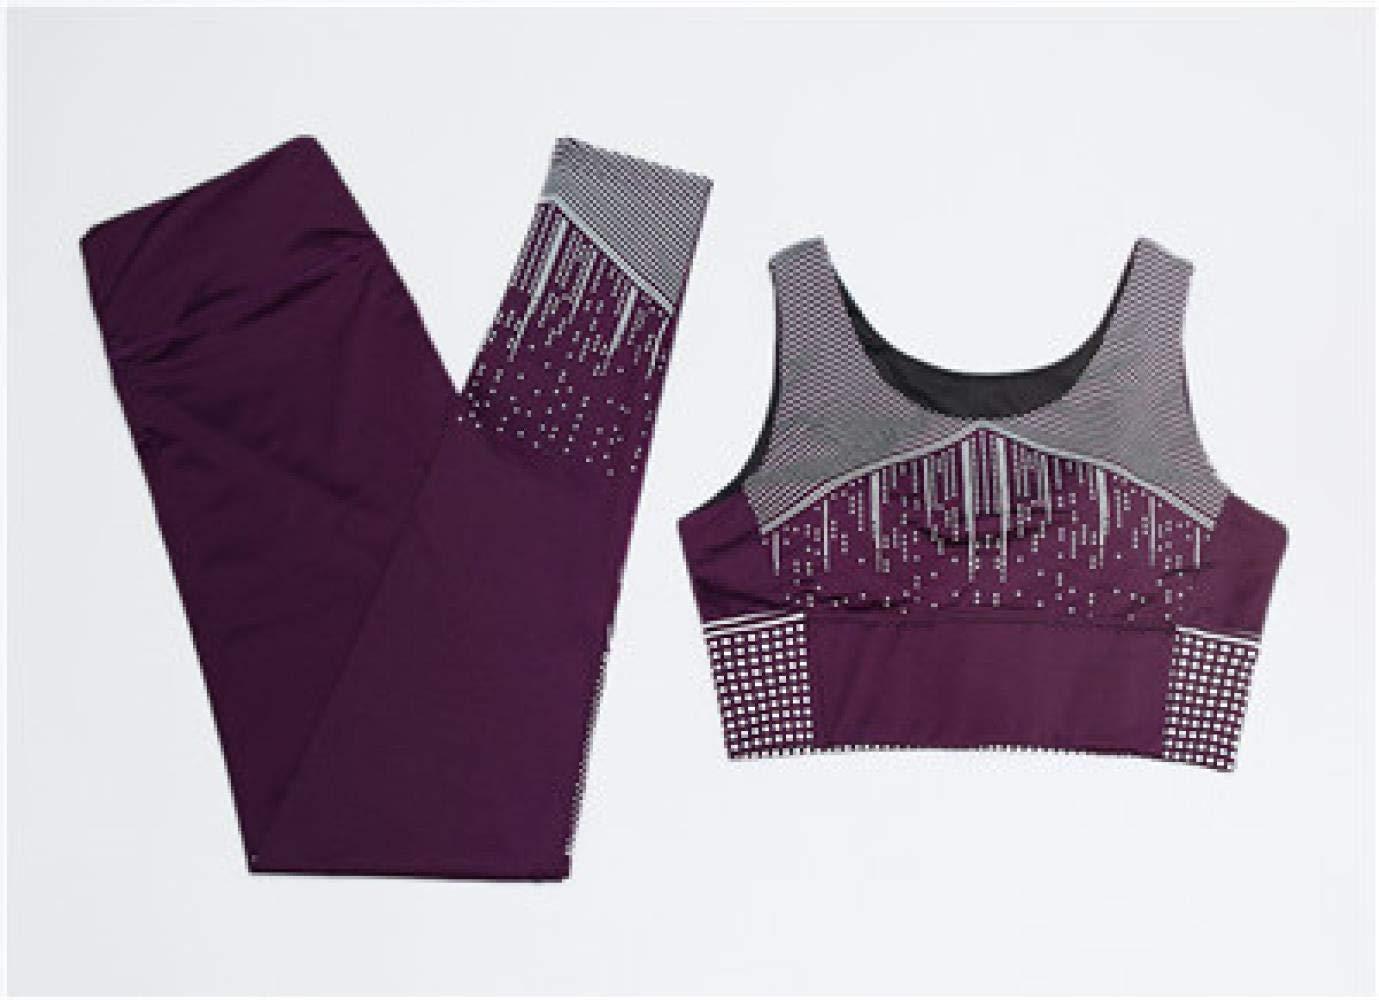 YANGCONG Yoga Fitness Bekleidung Frauen Yoga Set Weste + Strumpfhose Sportbekleidung Gym Sport BH Hosen Fitness Sport Anzug Laufbekleidung 2 STÜCKE Lila M